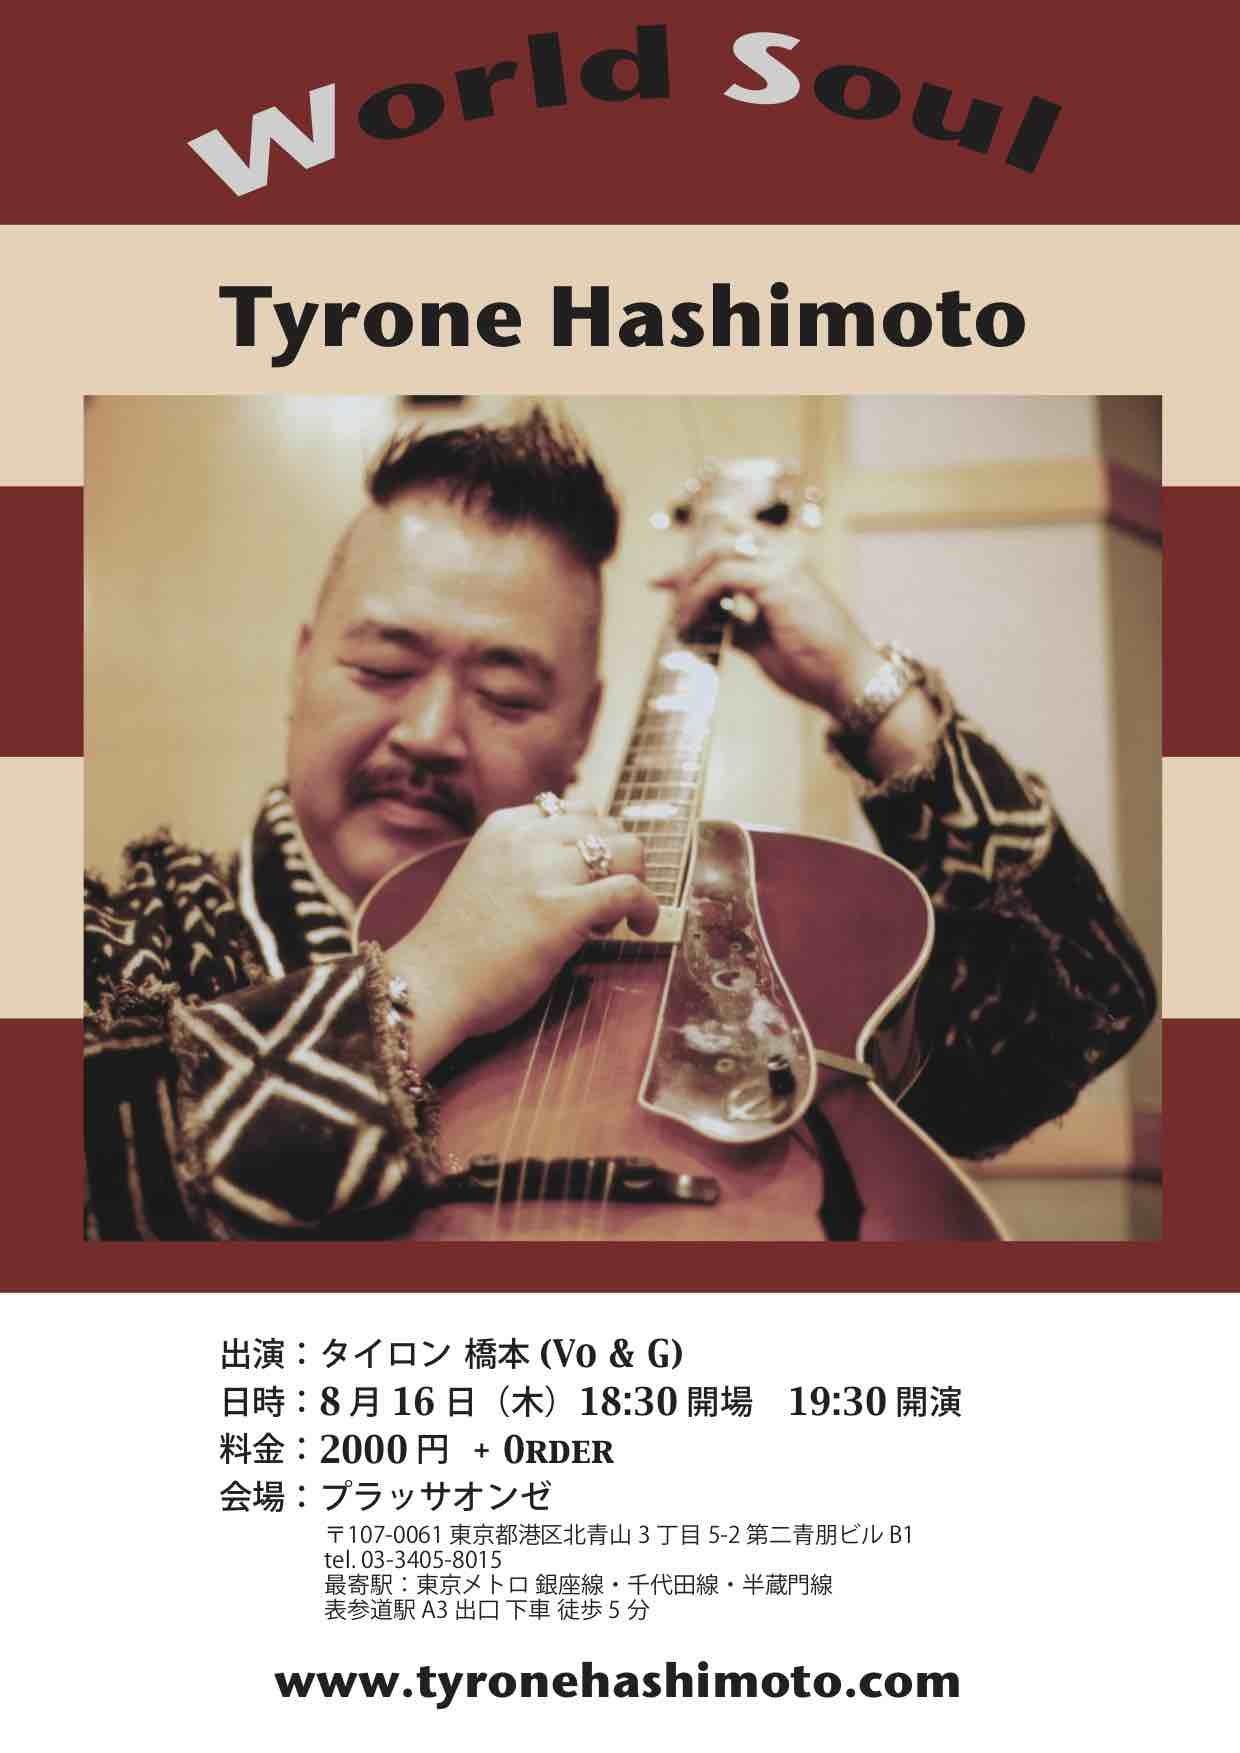 Tyrone Hashimoto 8月 ライブ情報_c0368808_01385474.jpg